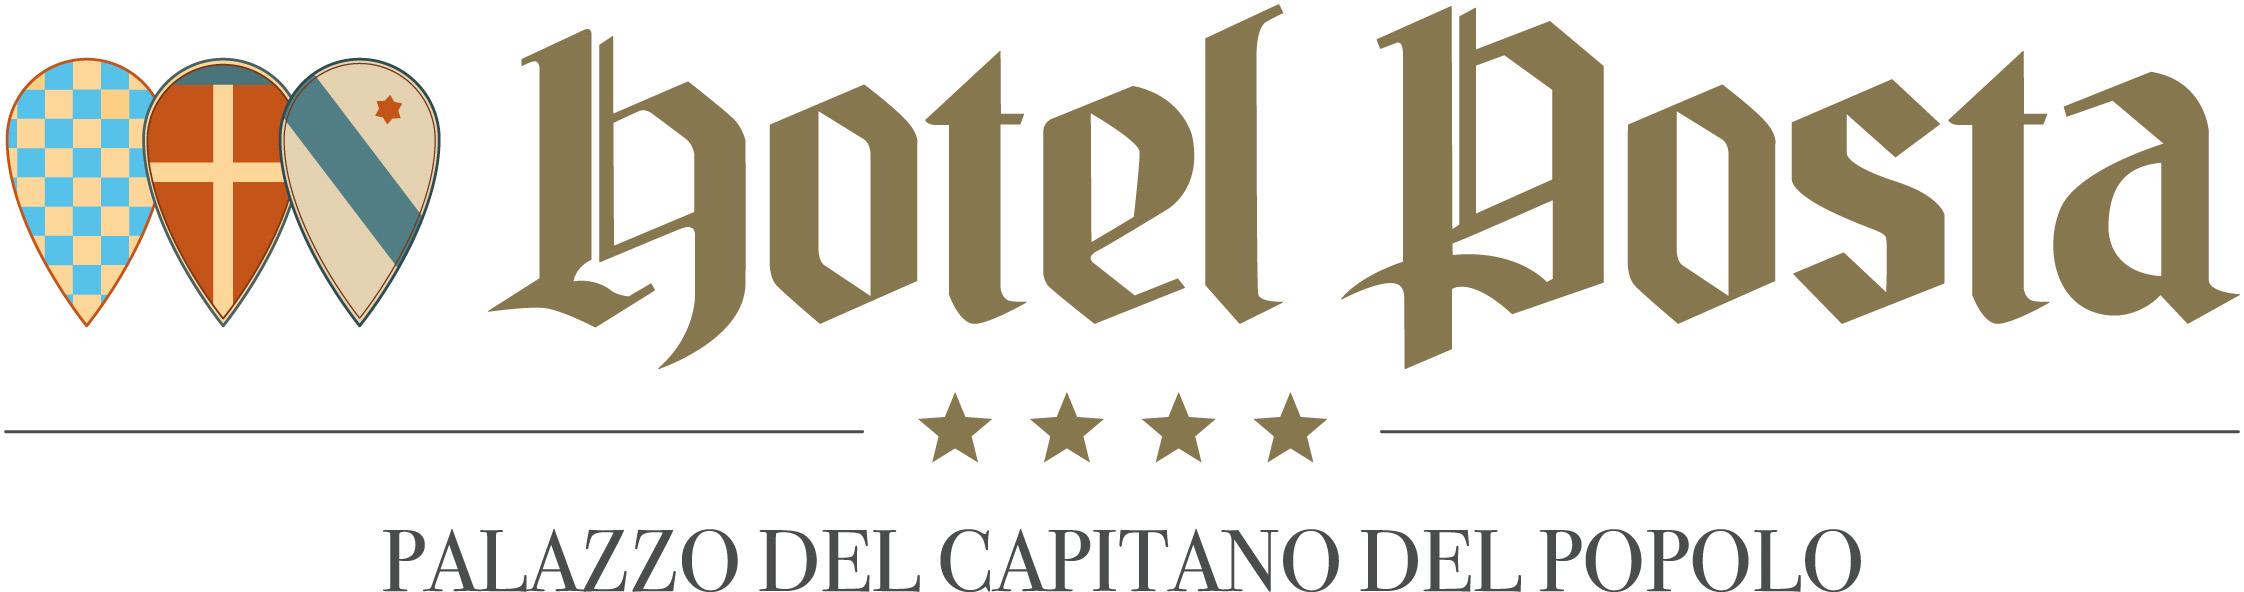 Hotel Posta Re - Reggio Emilia